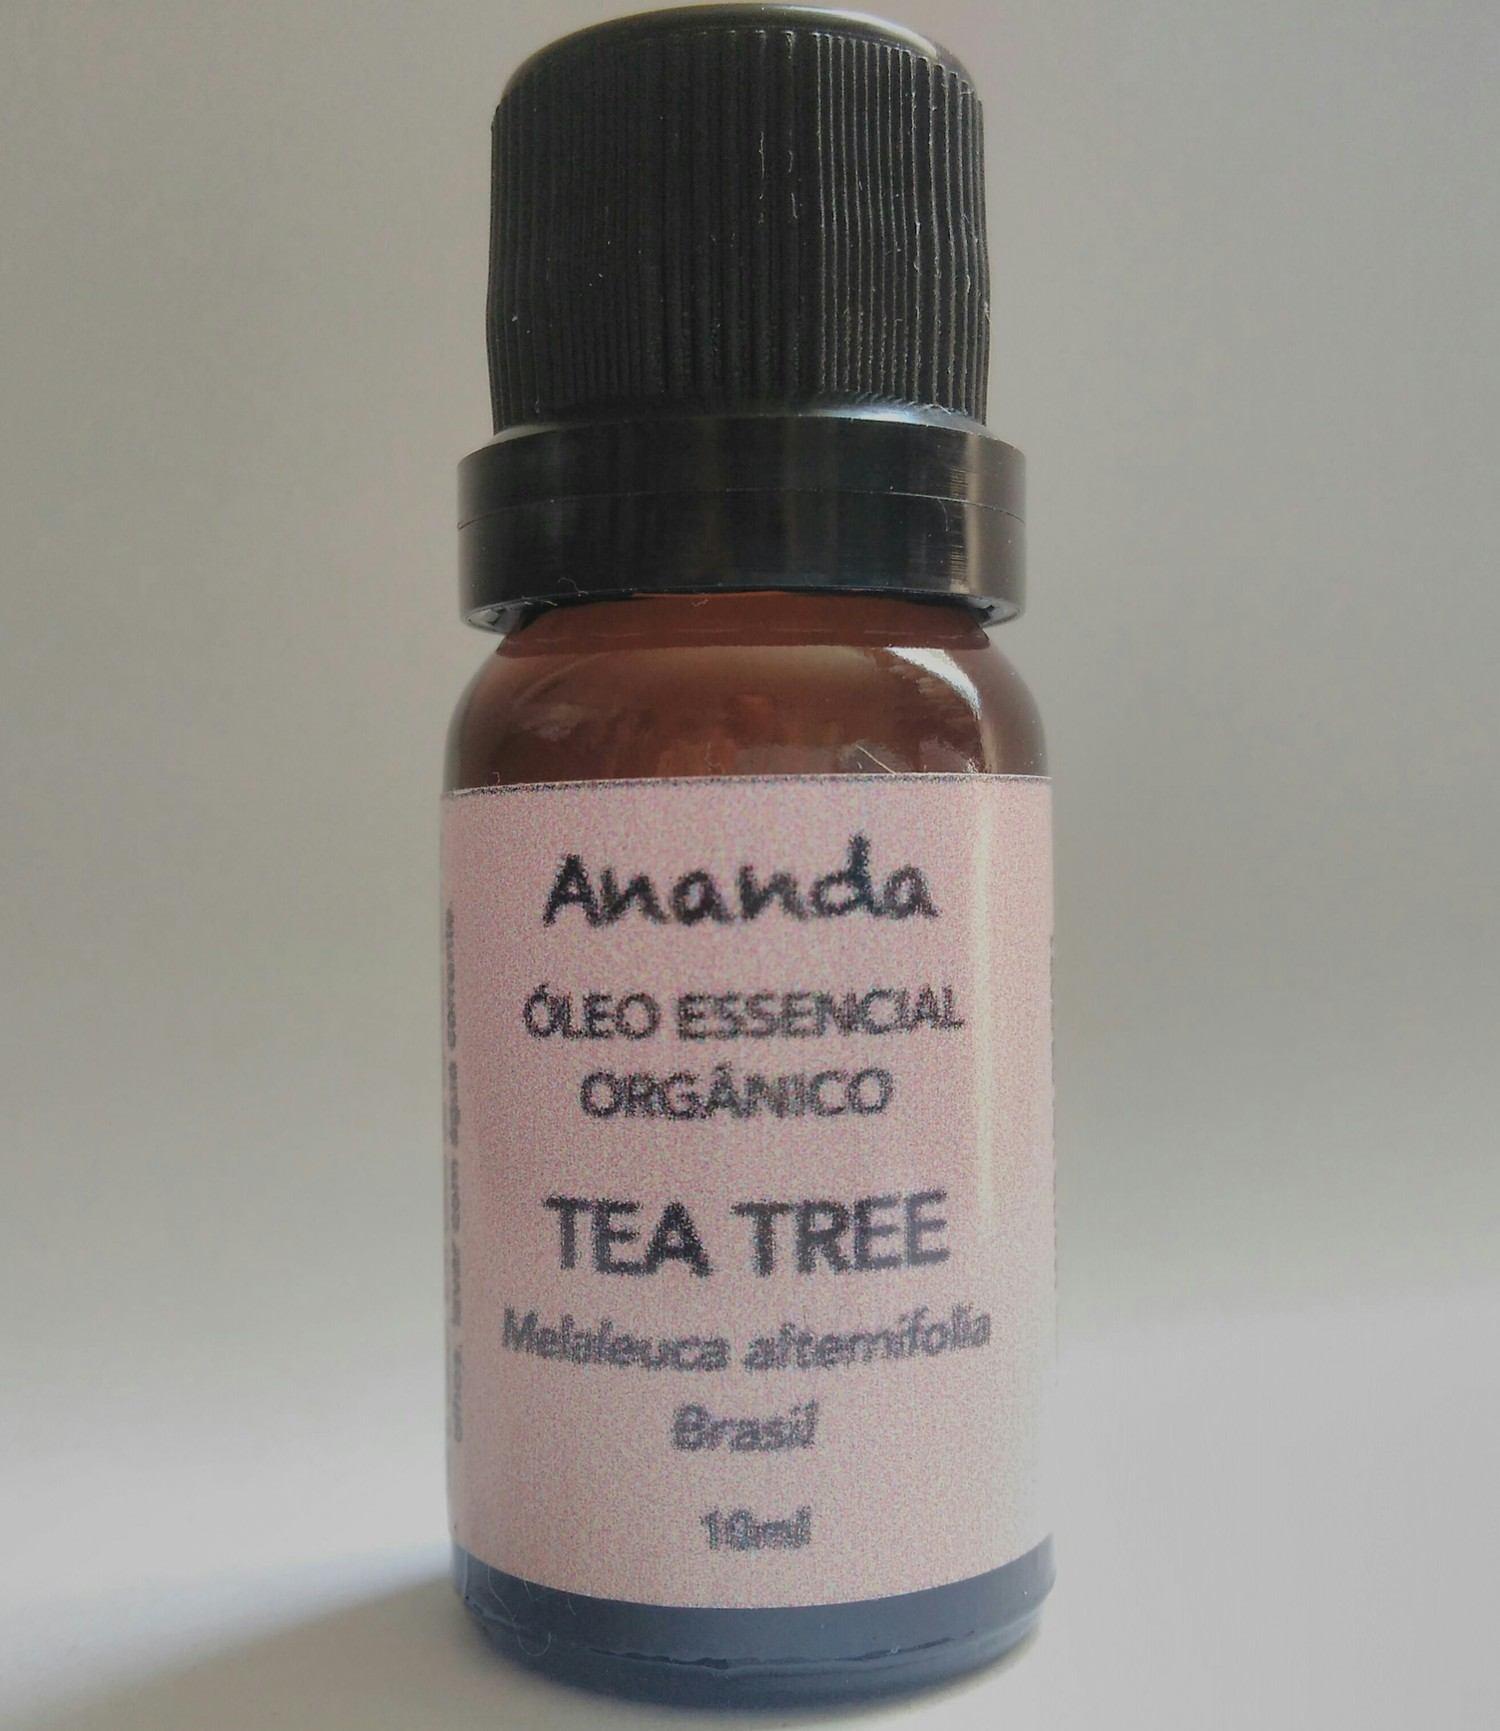 Óleo Essencial de Tea Tree (Melaleuca) orgânico 10ml